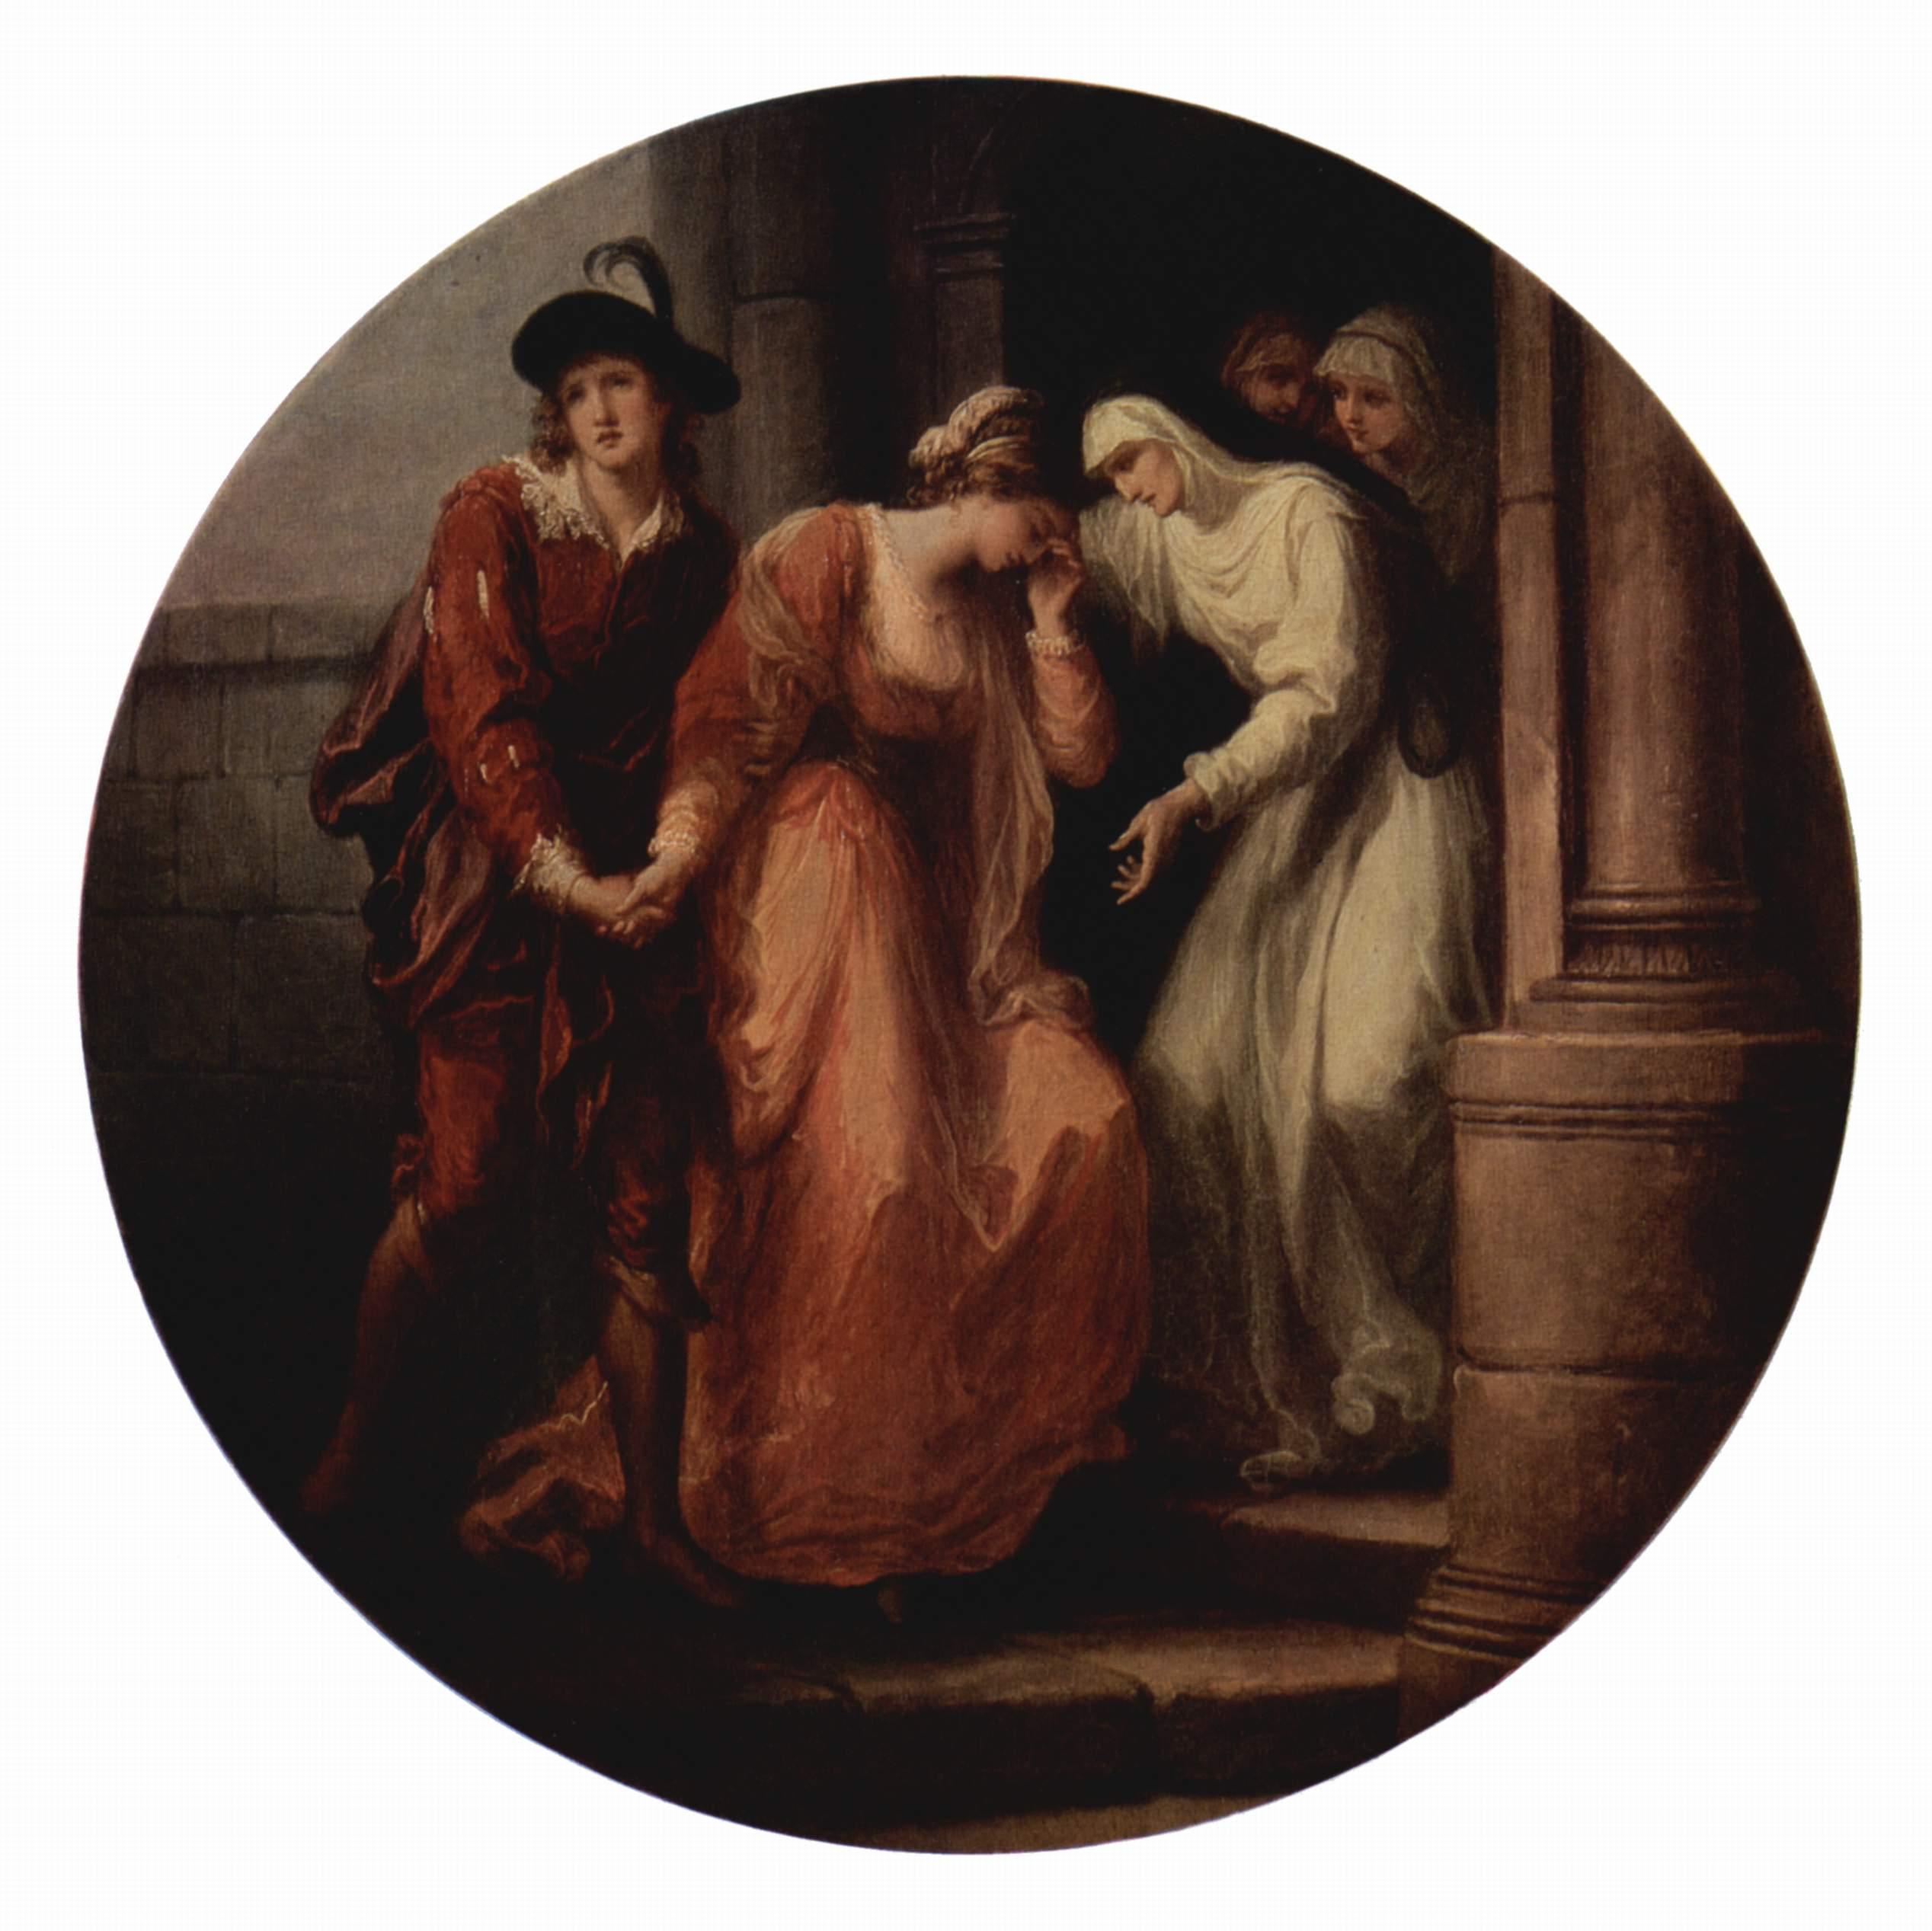 Прощание Абеляра и Элоизы, Кауфман Ангелика Мария